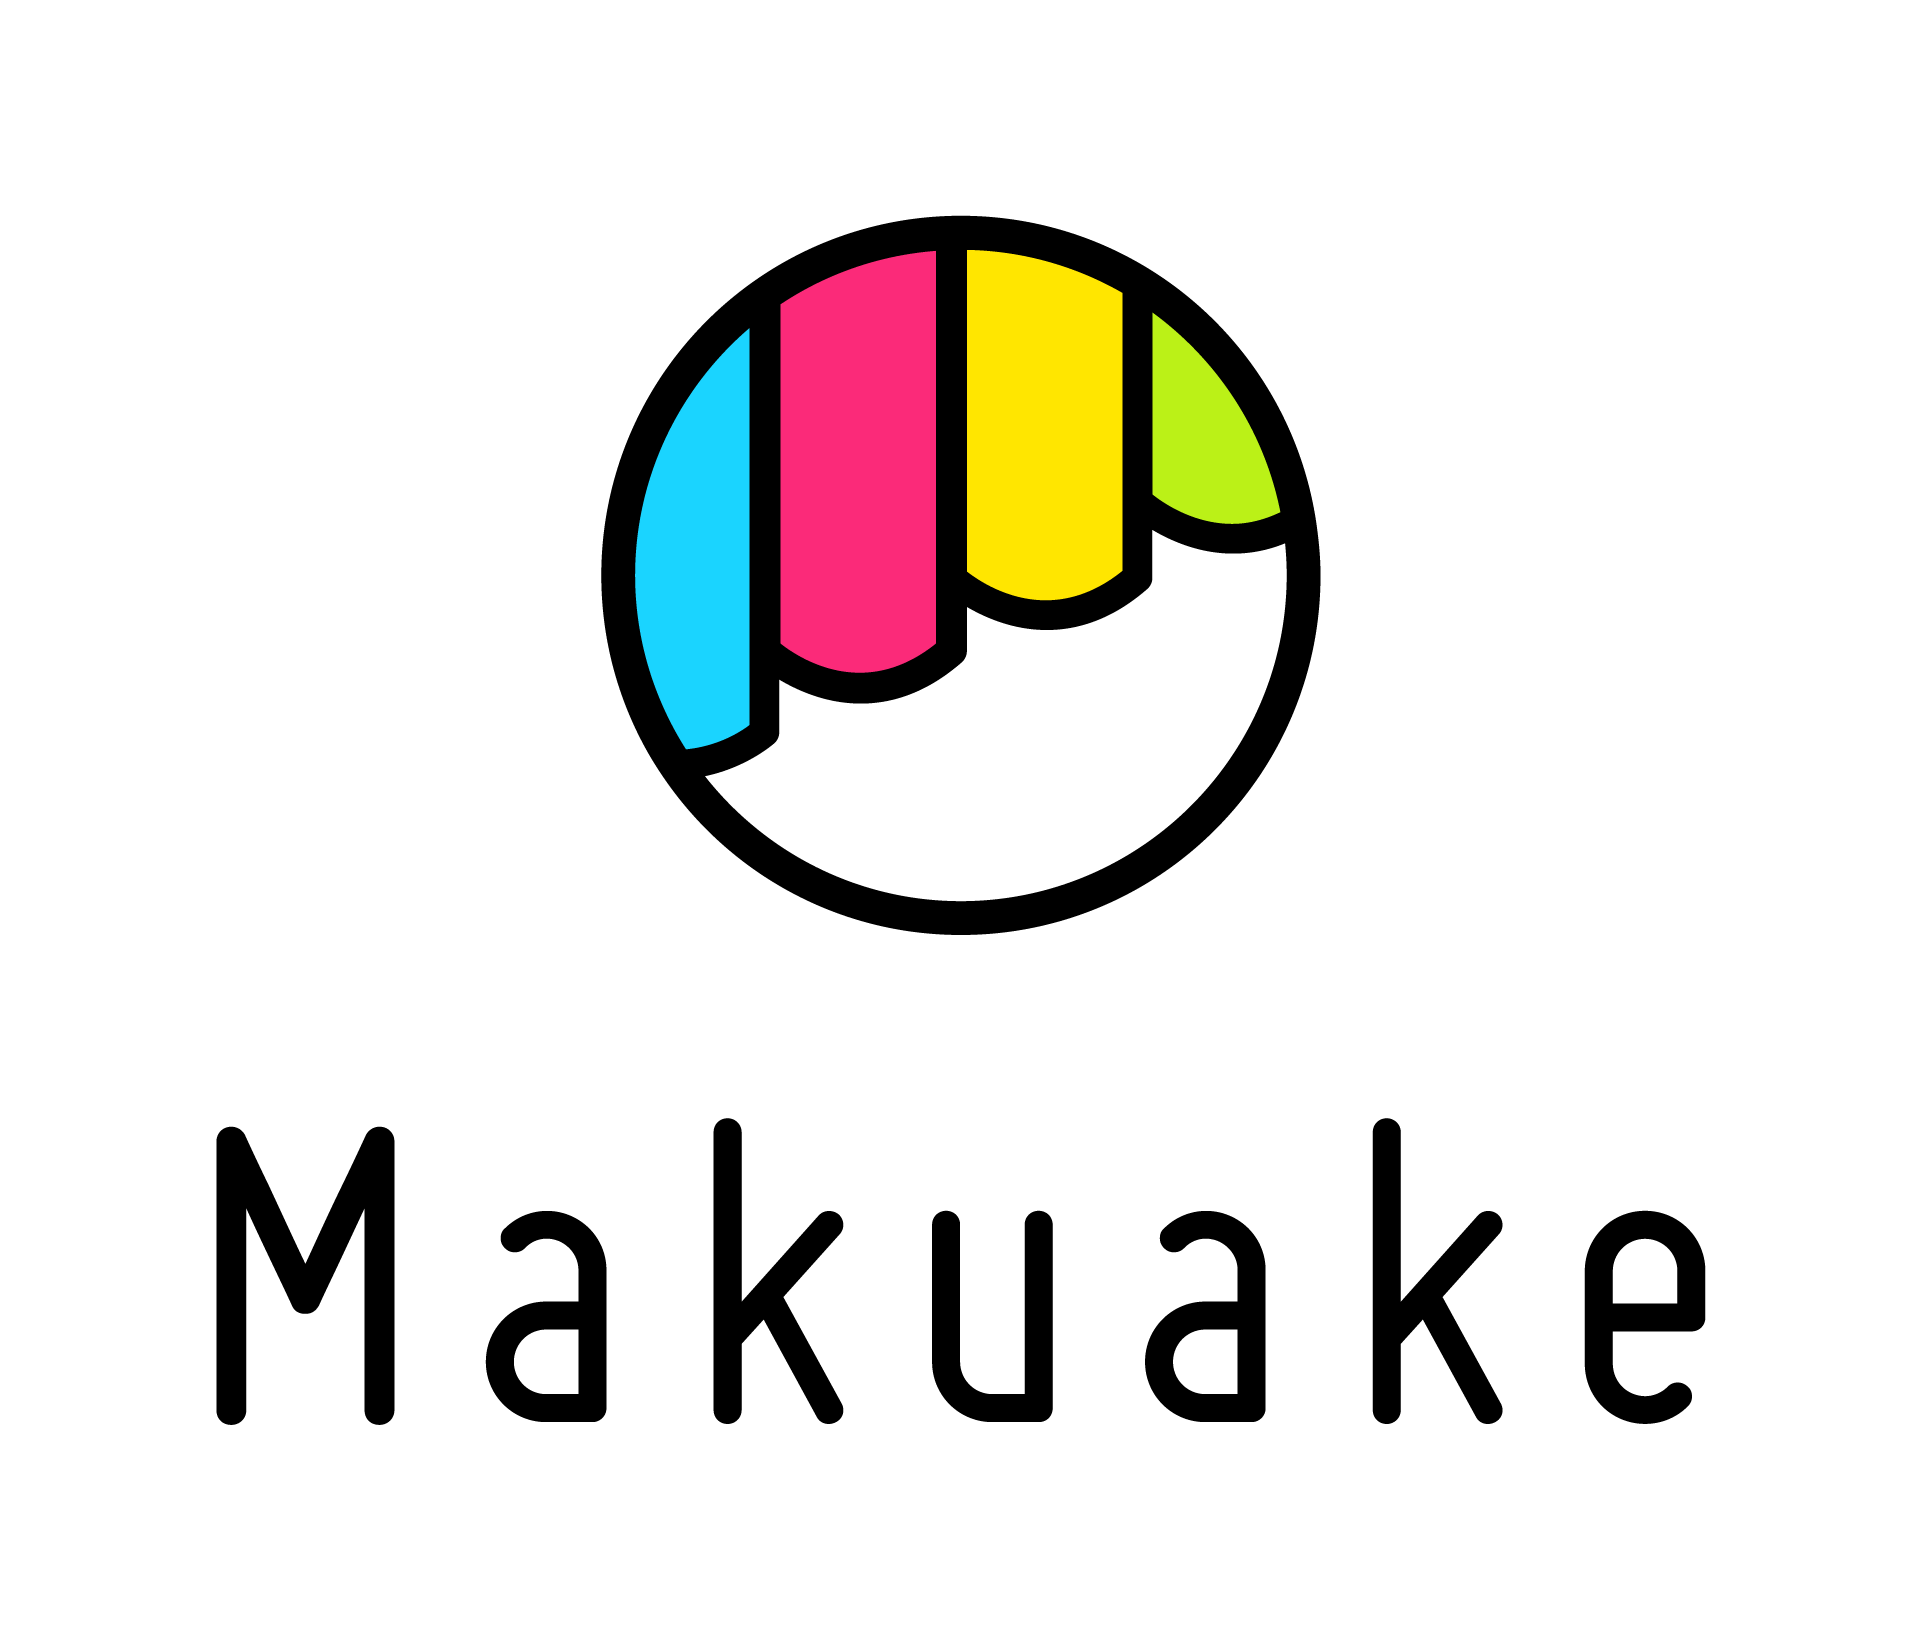 『COSMOS認証オーガニックブランド『AOLUAM』 Makuakeにて公開を開始いたしました。』へのリンク